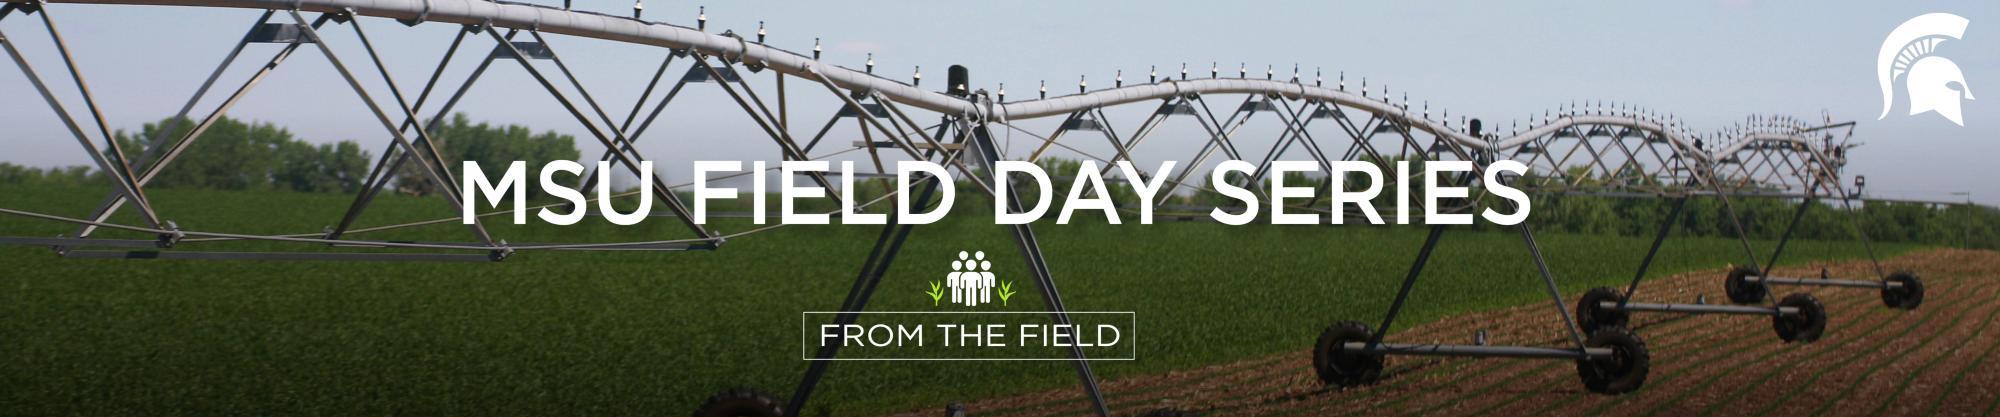 Michigan state university Field Day Series logo.